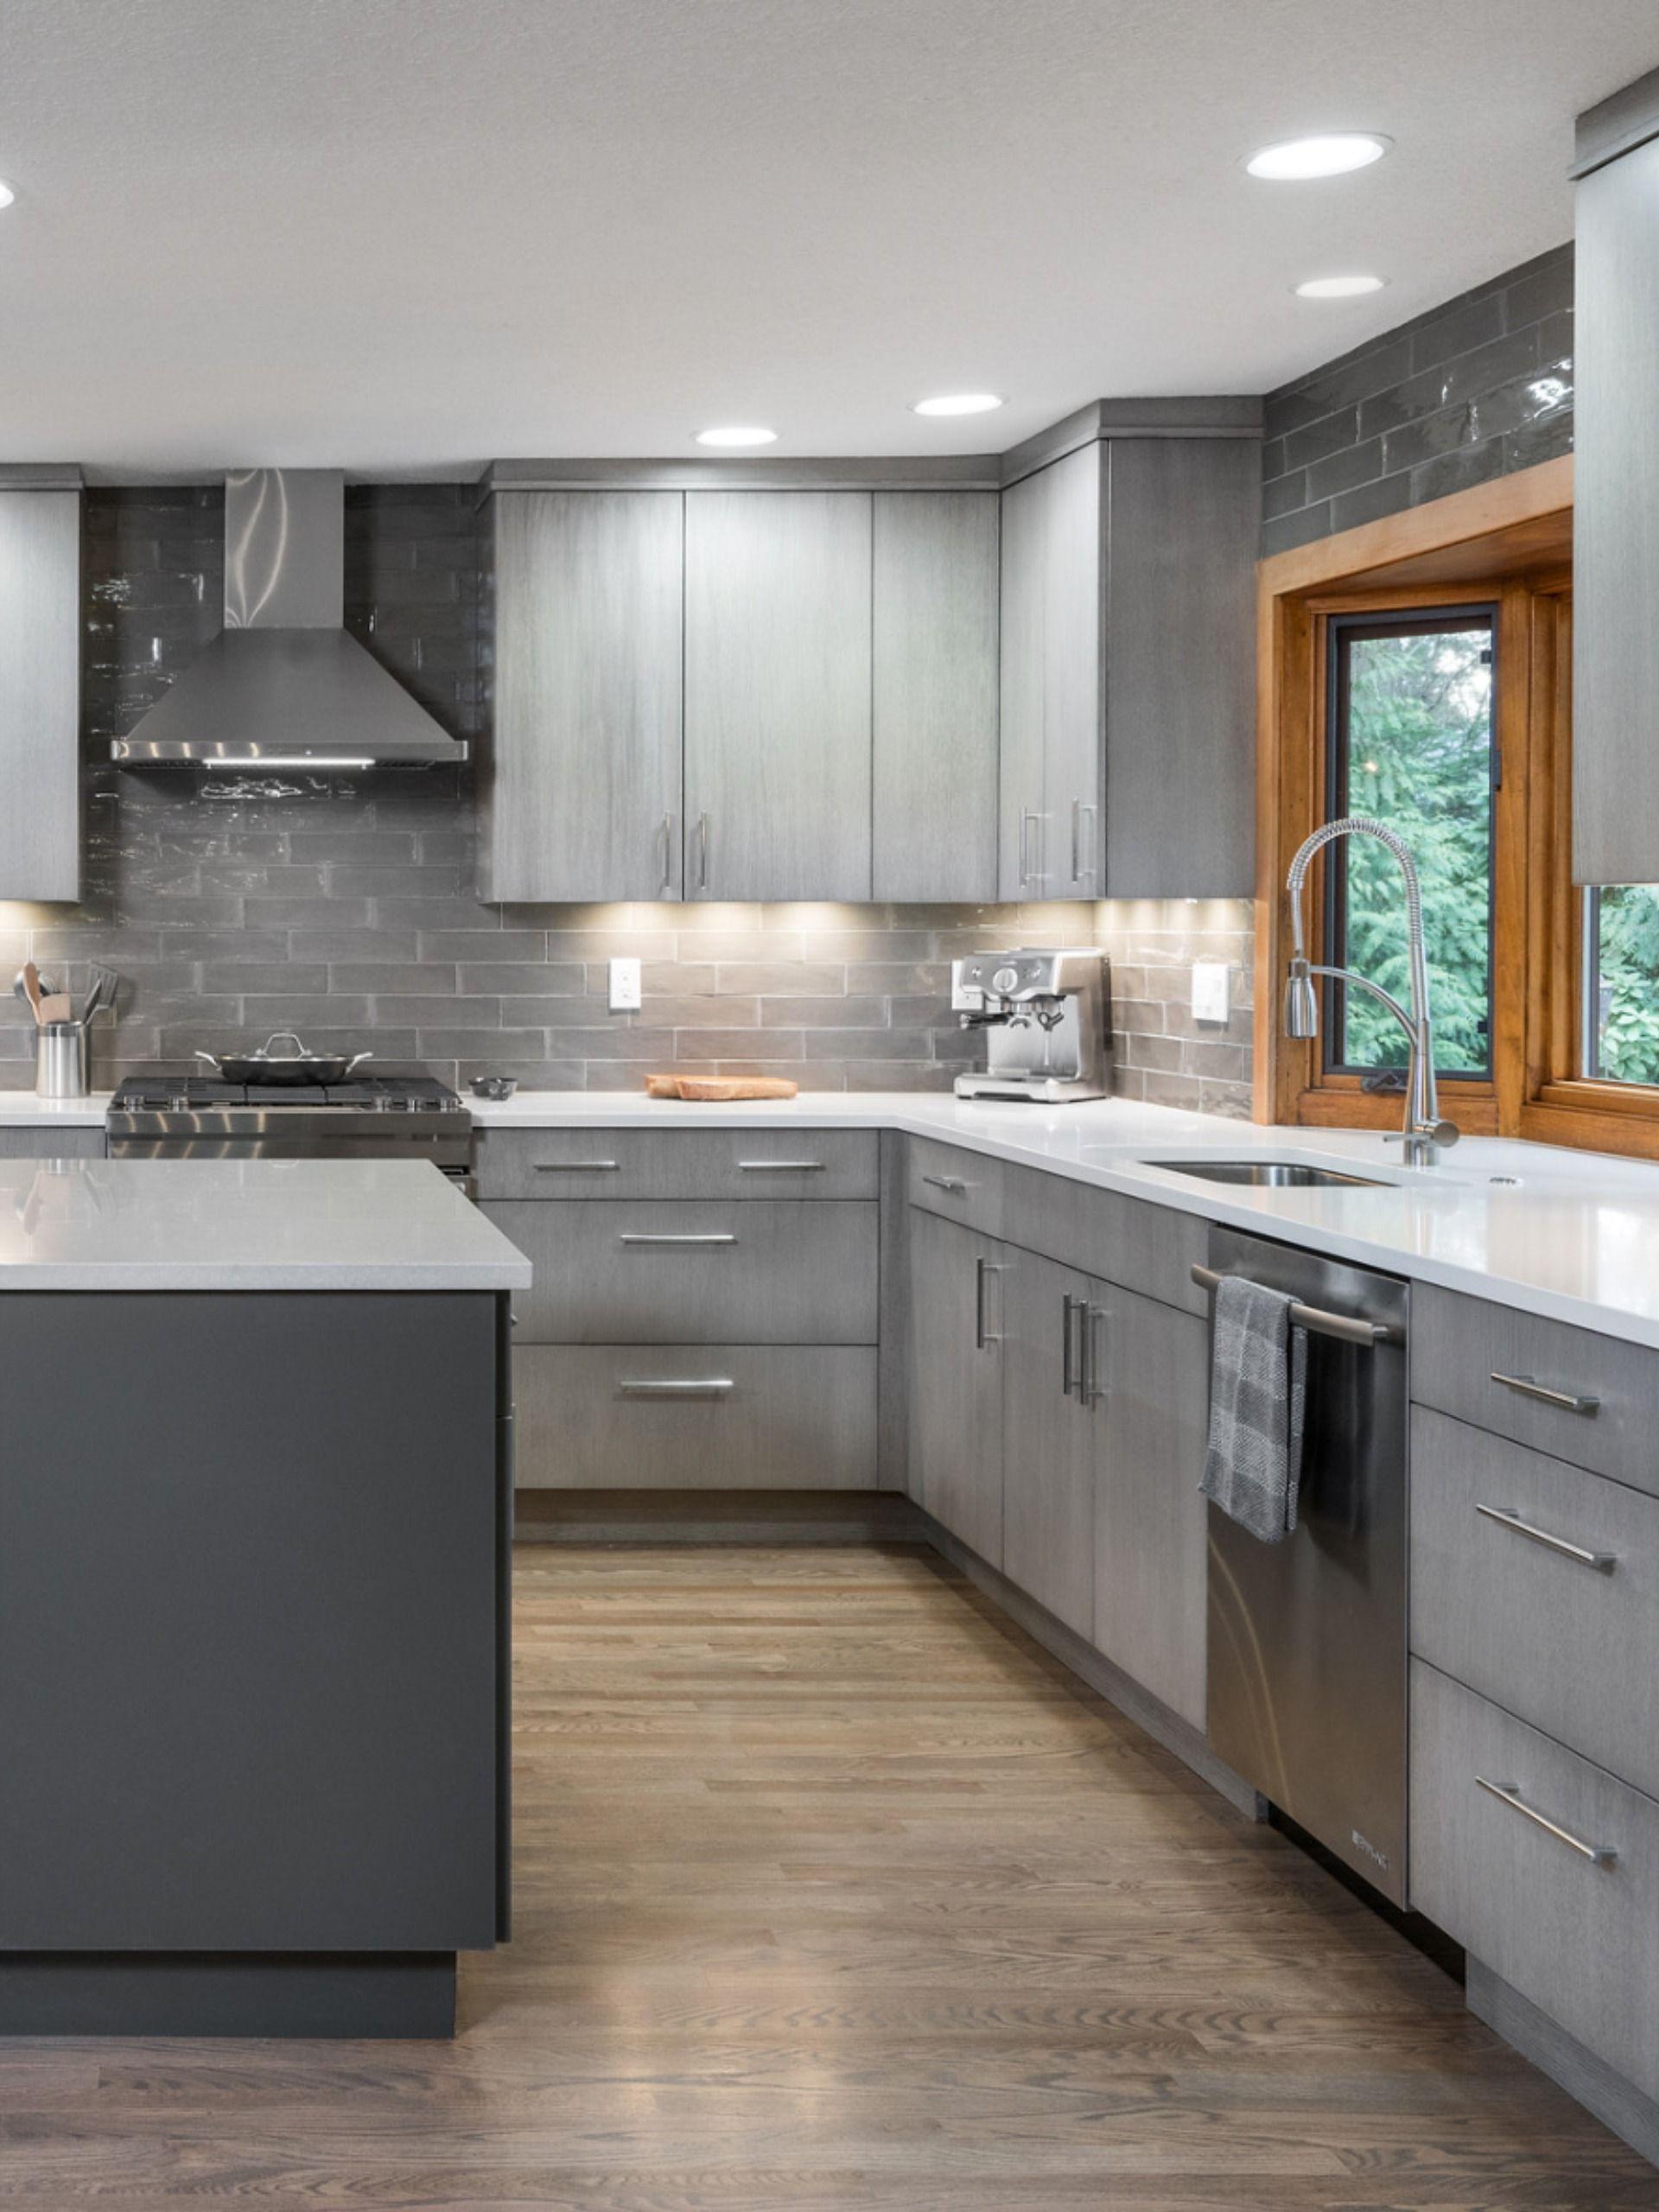 Warm Grey Kitchen Remodel Nw Contemporary Contemporary Grey Kitchen Kitchen Room Design Grey Kitchen Designs